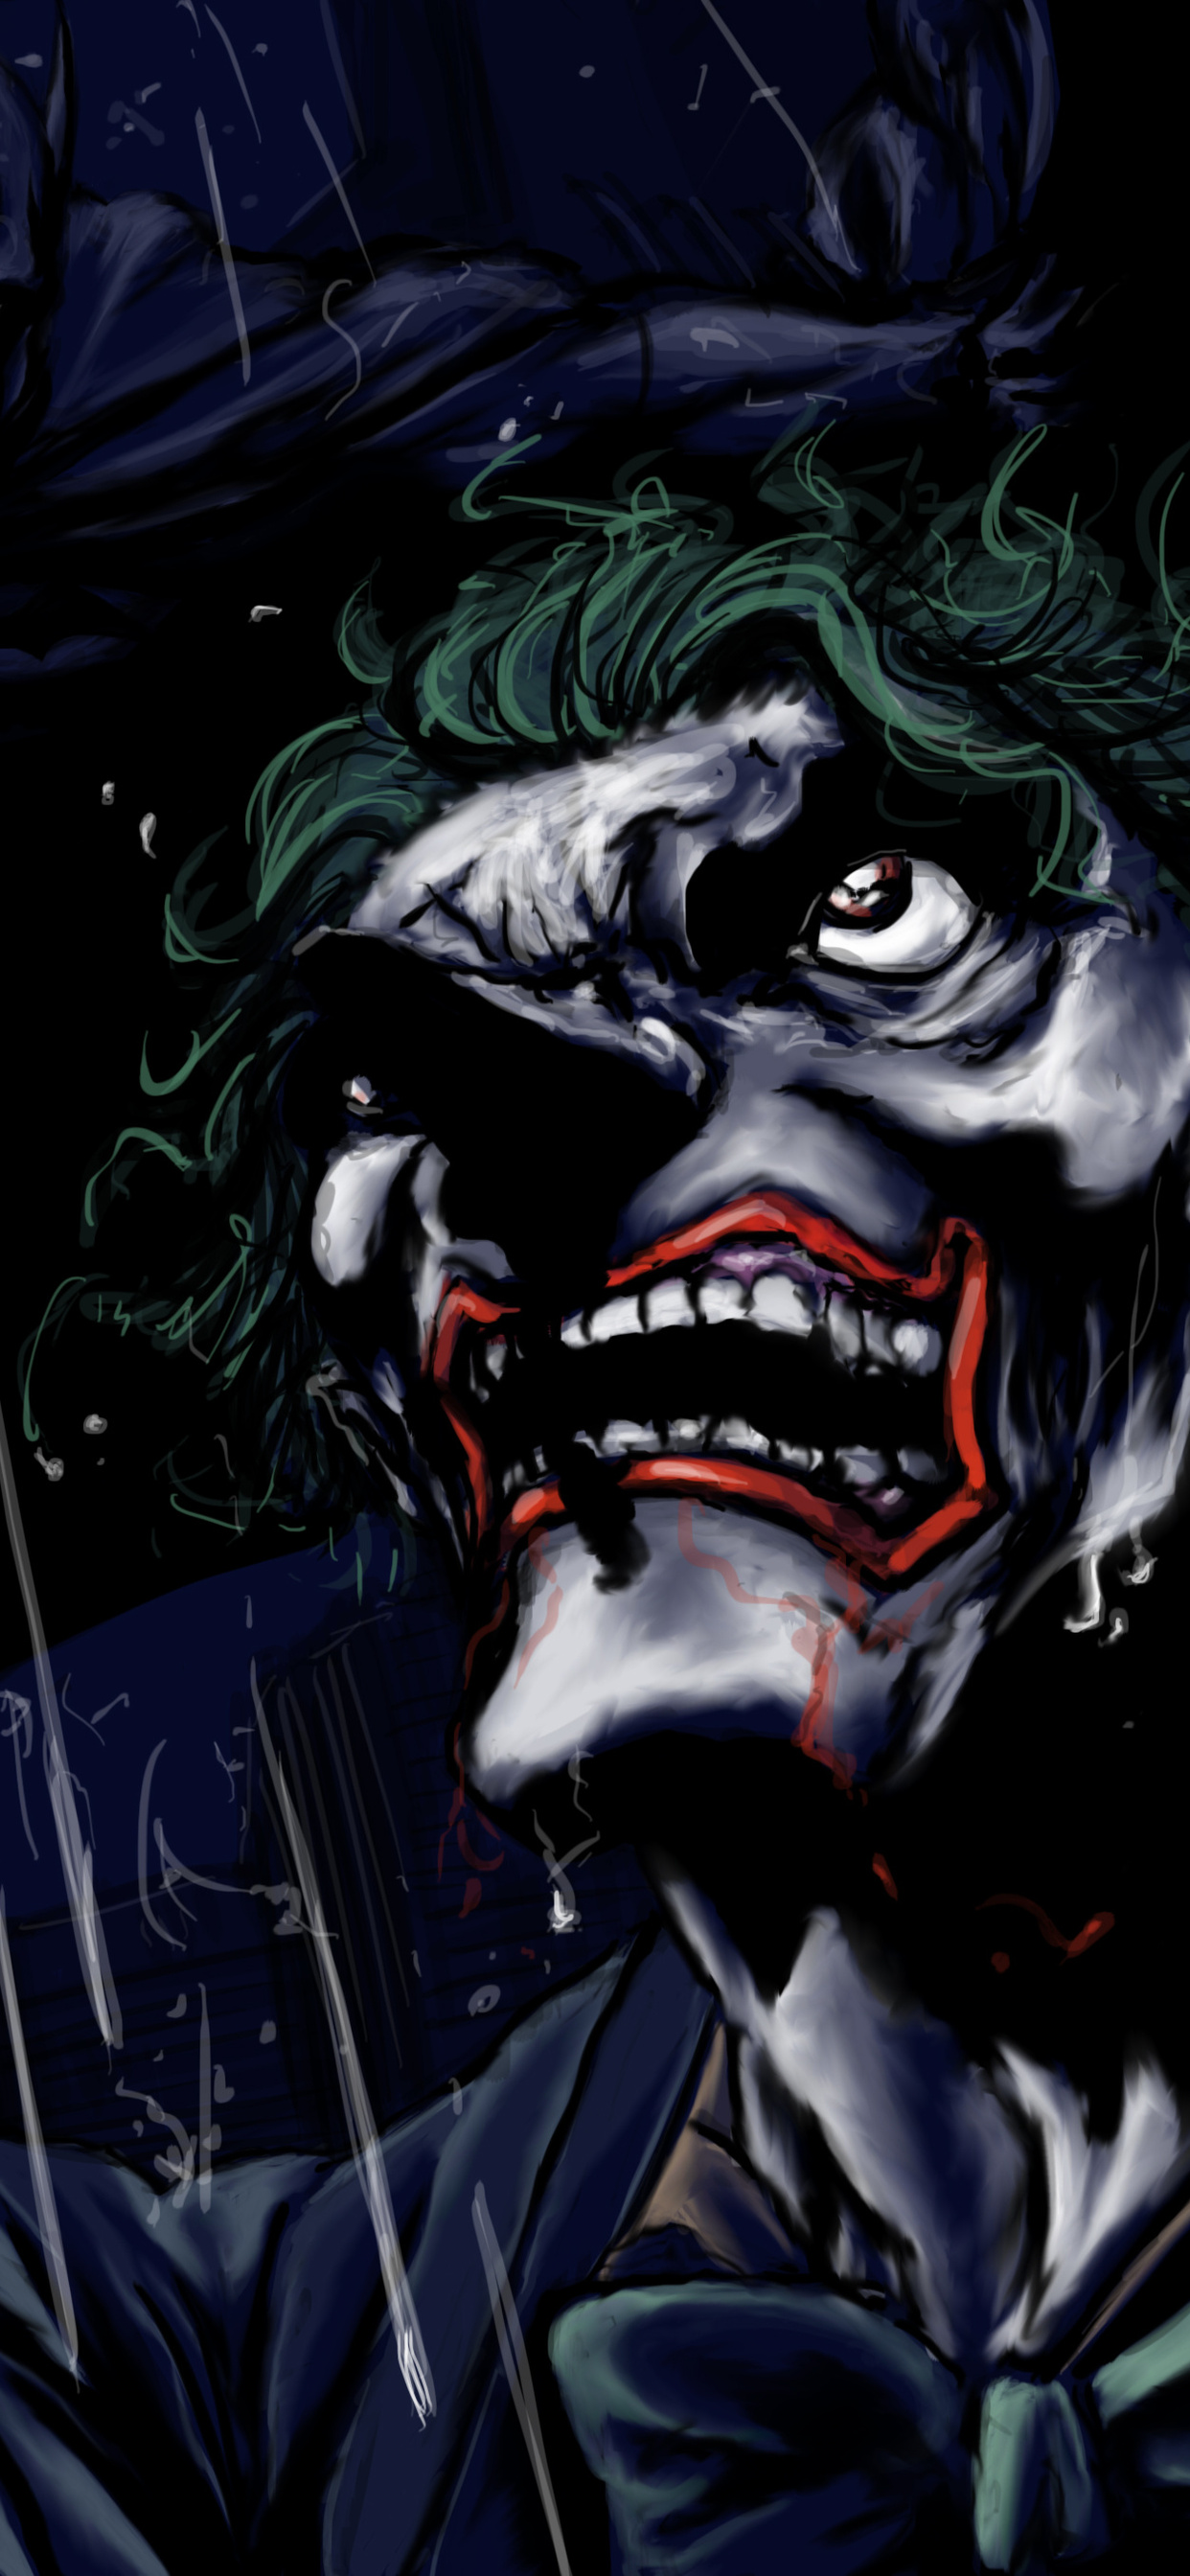 1242x2688 Joker Night 4k Iphone Xs Max Hd 4k Wallpapers Images